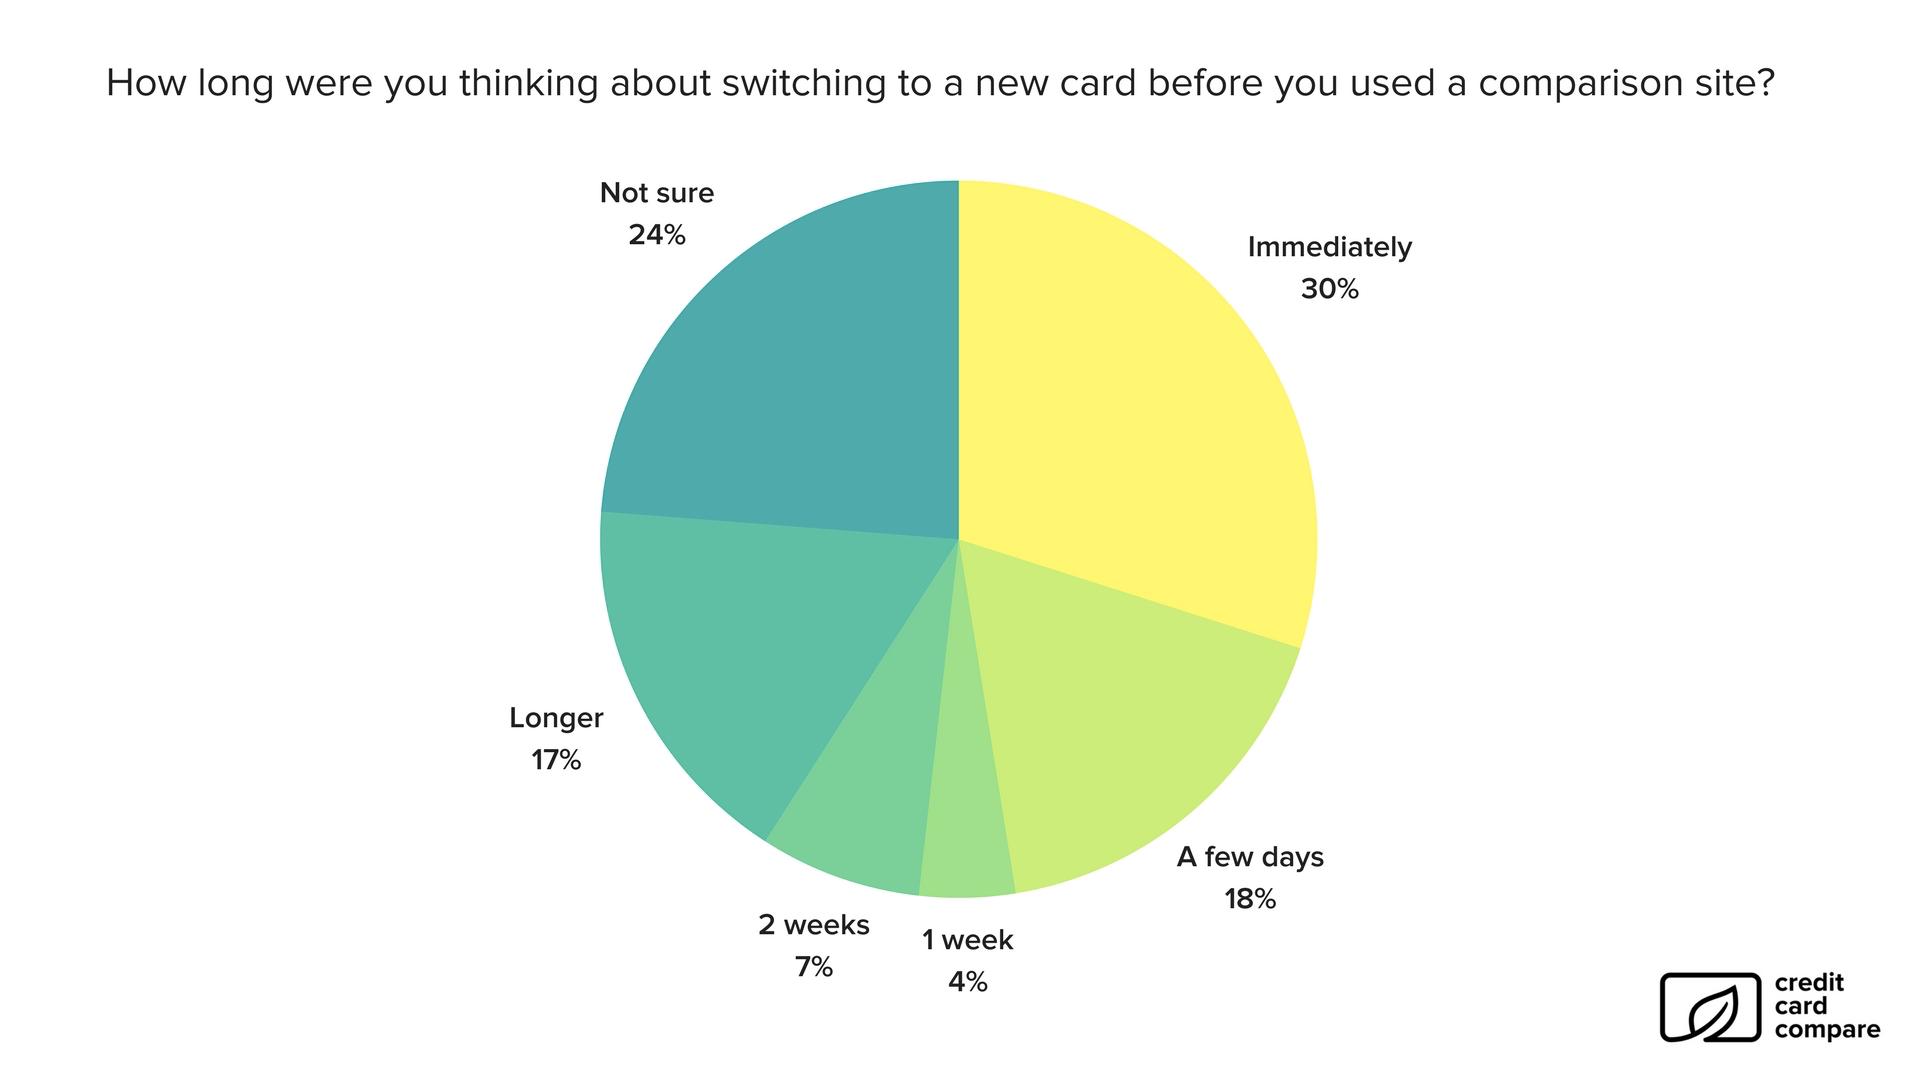 Survey response 5